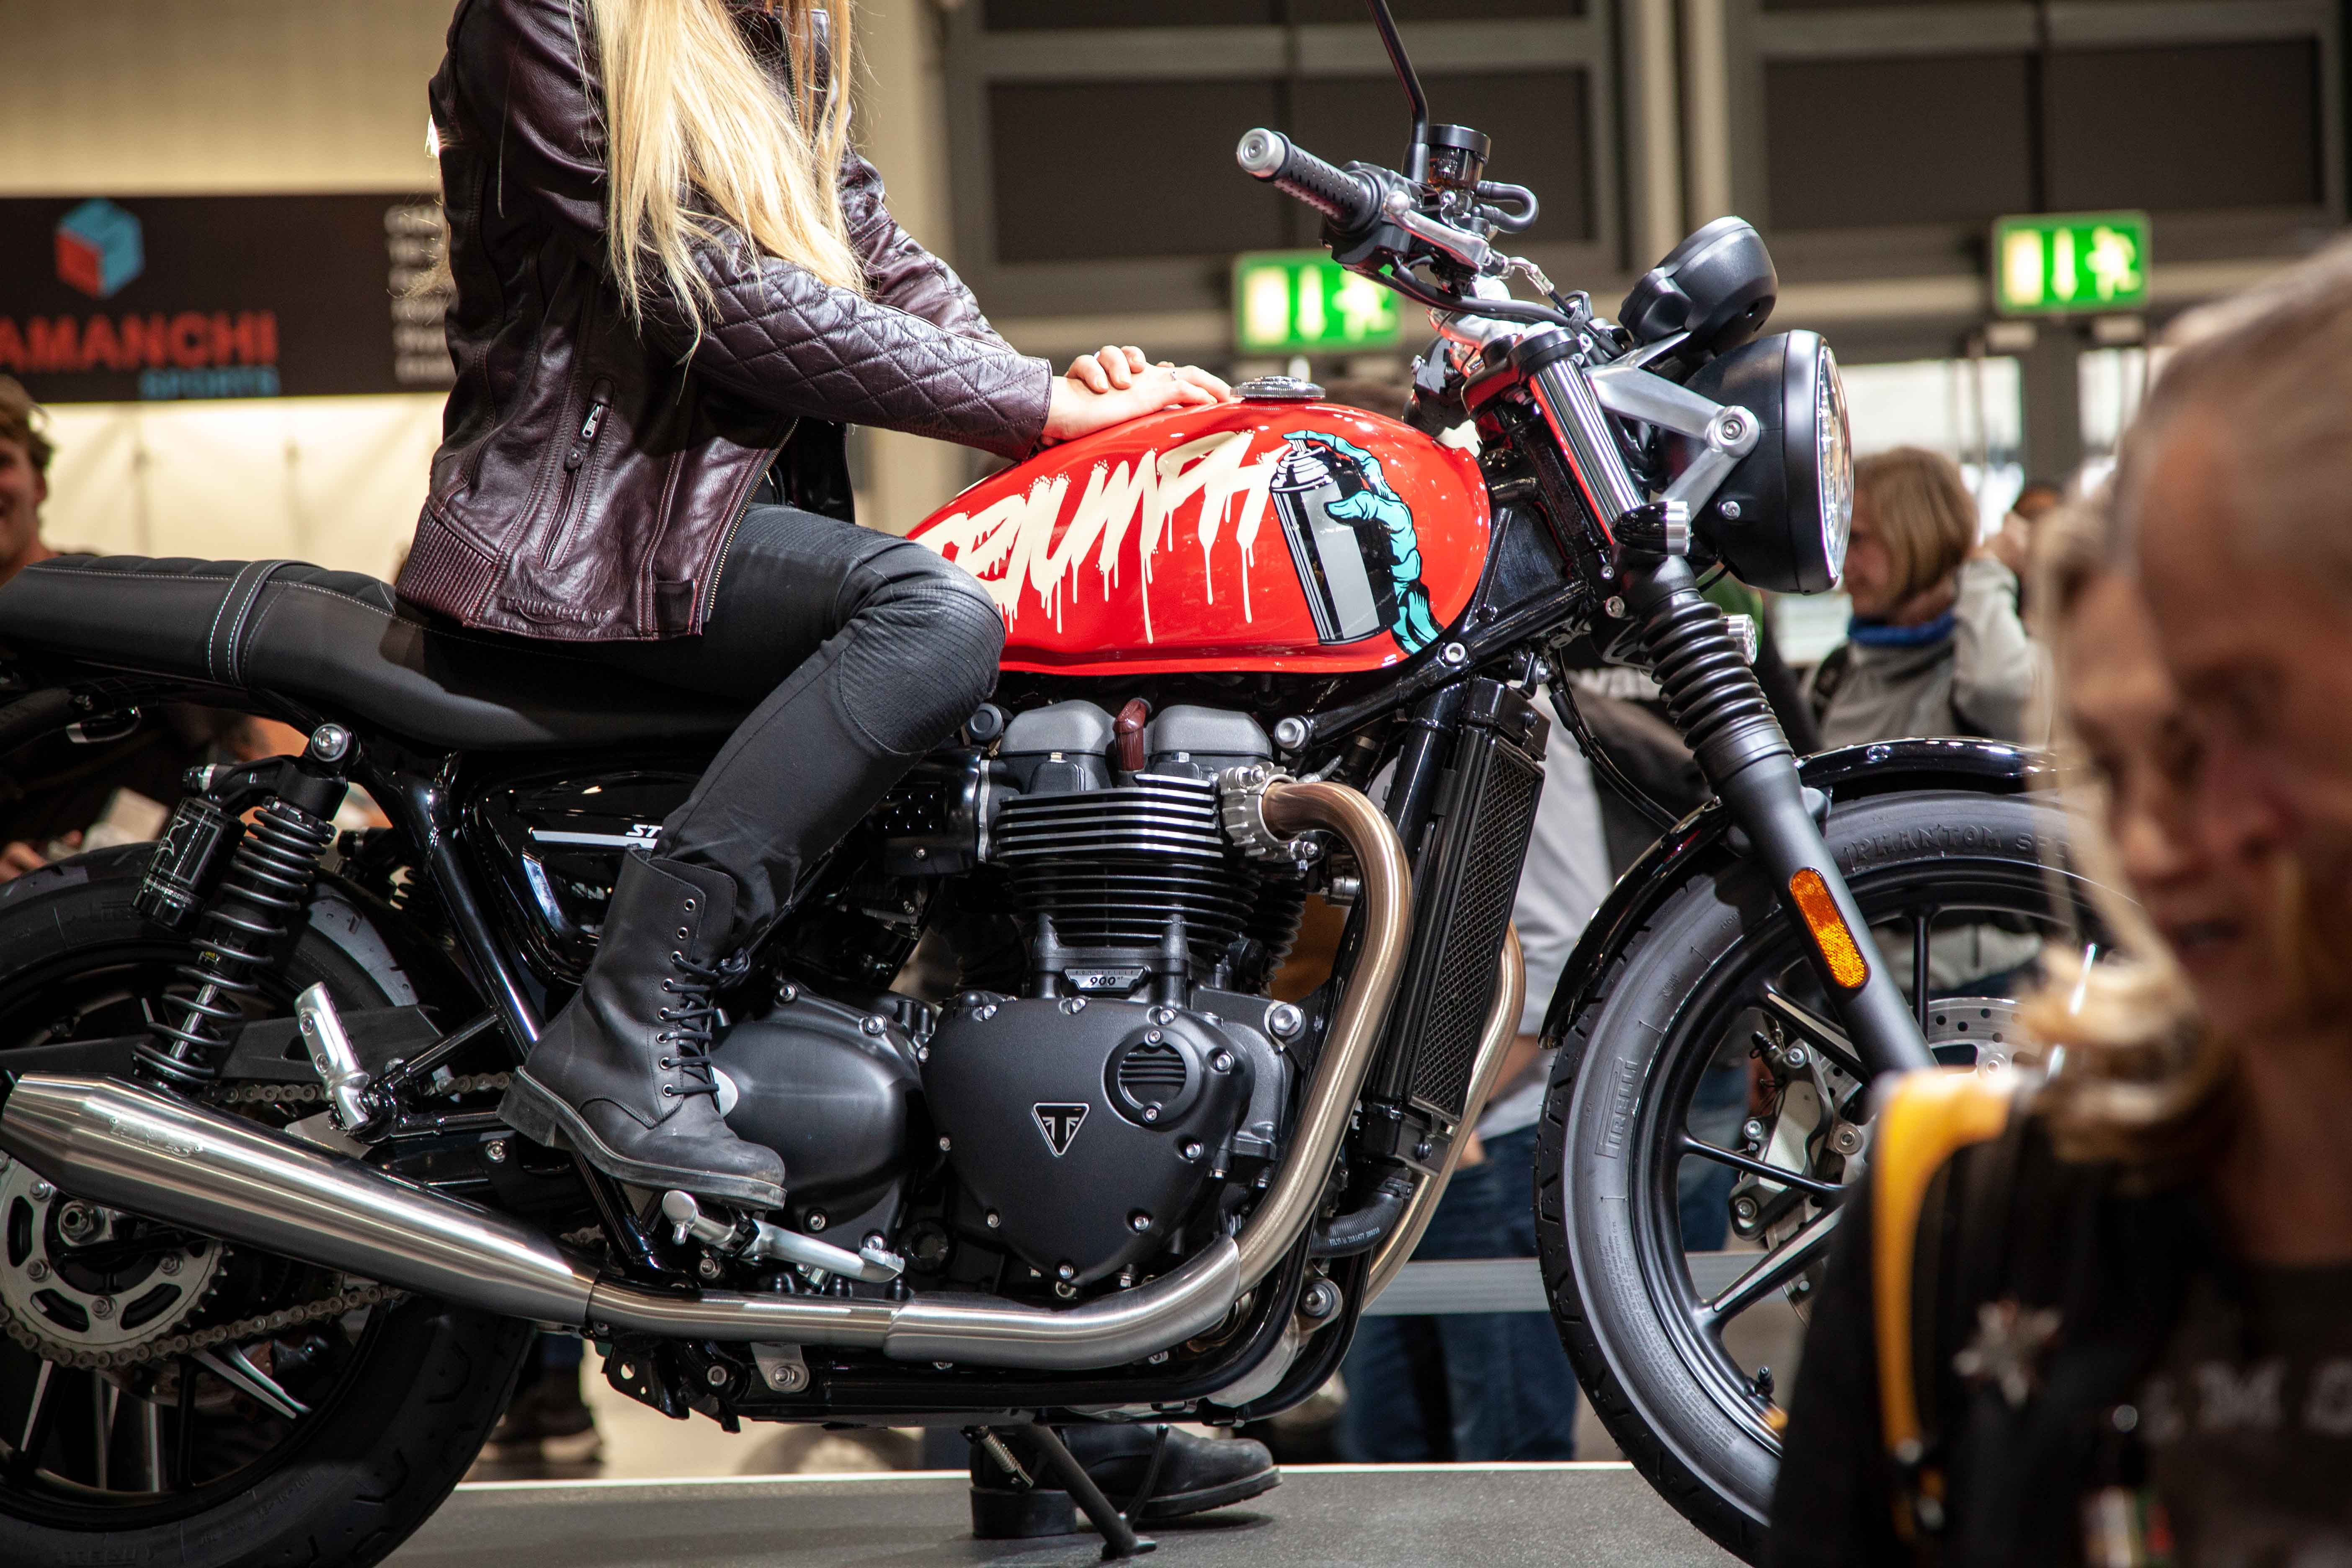 Triumph Announces Updated 2019 Bonneville Street Twin And Street